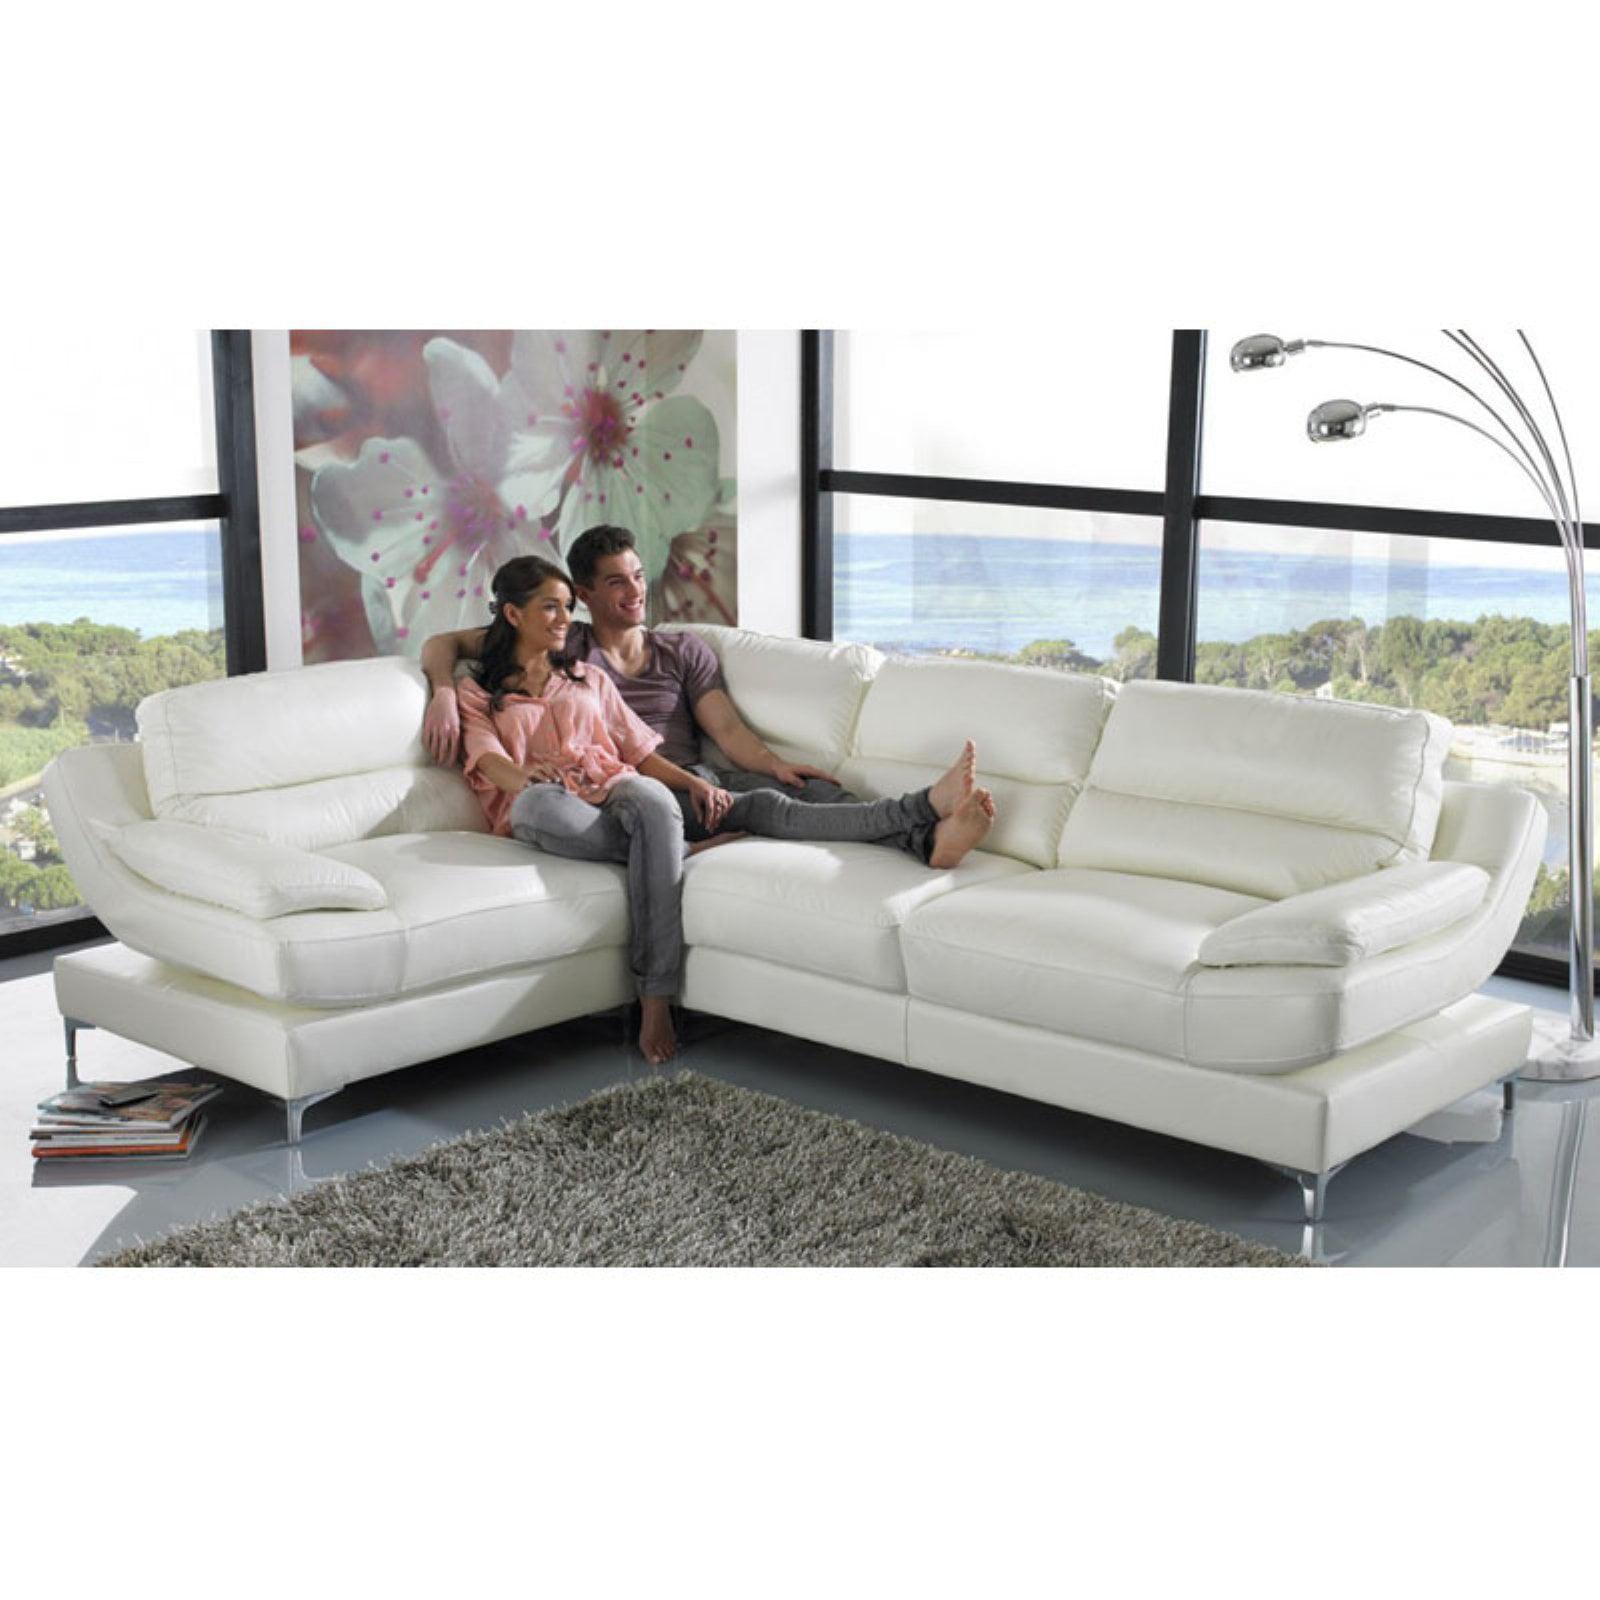 Terrific Divani Casa Clio Modern Eco Leather Sectional Sofa Walmart Com Ncnpc Chair Design For Home Ncnpcorg